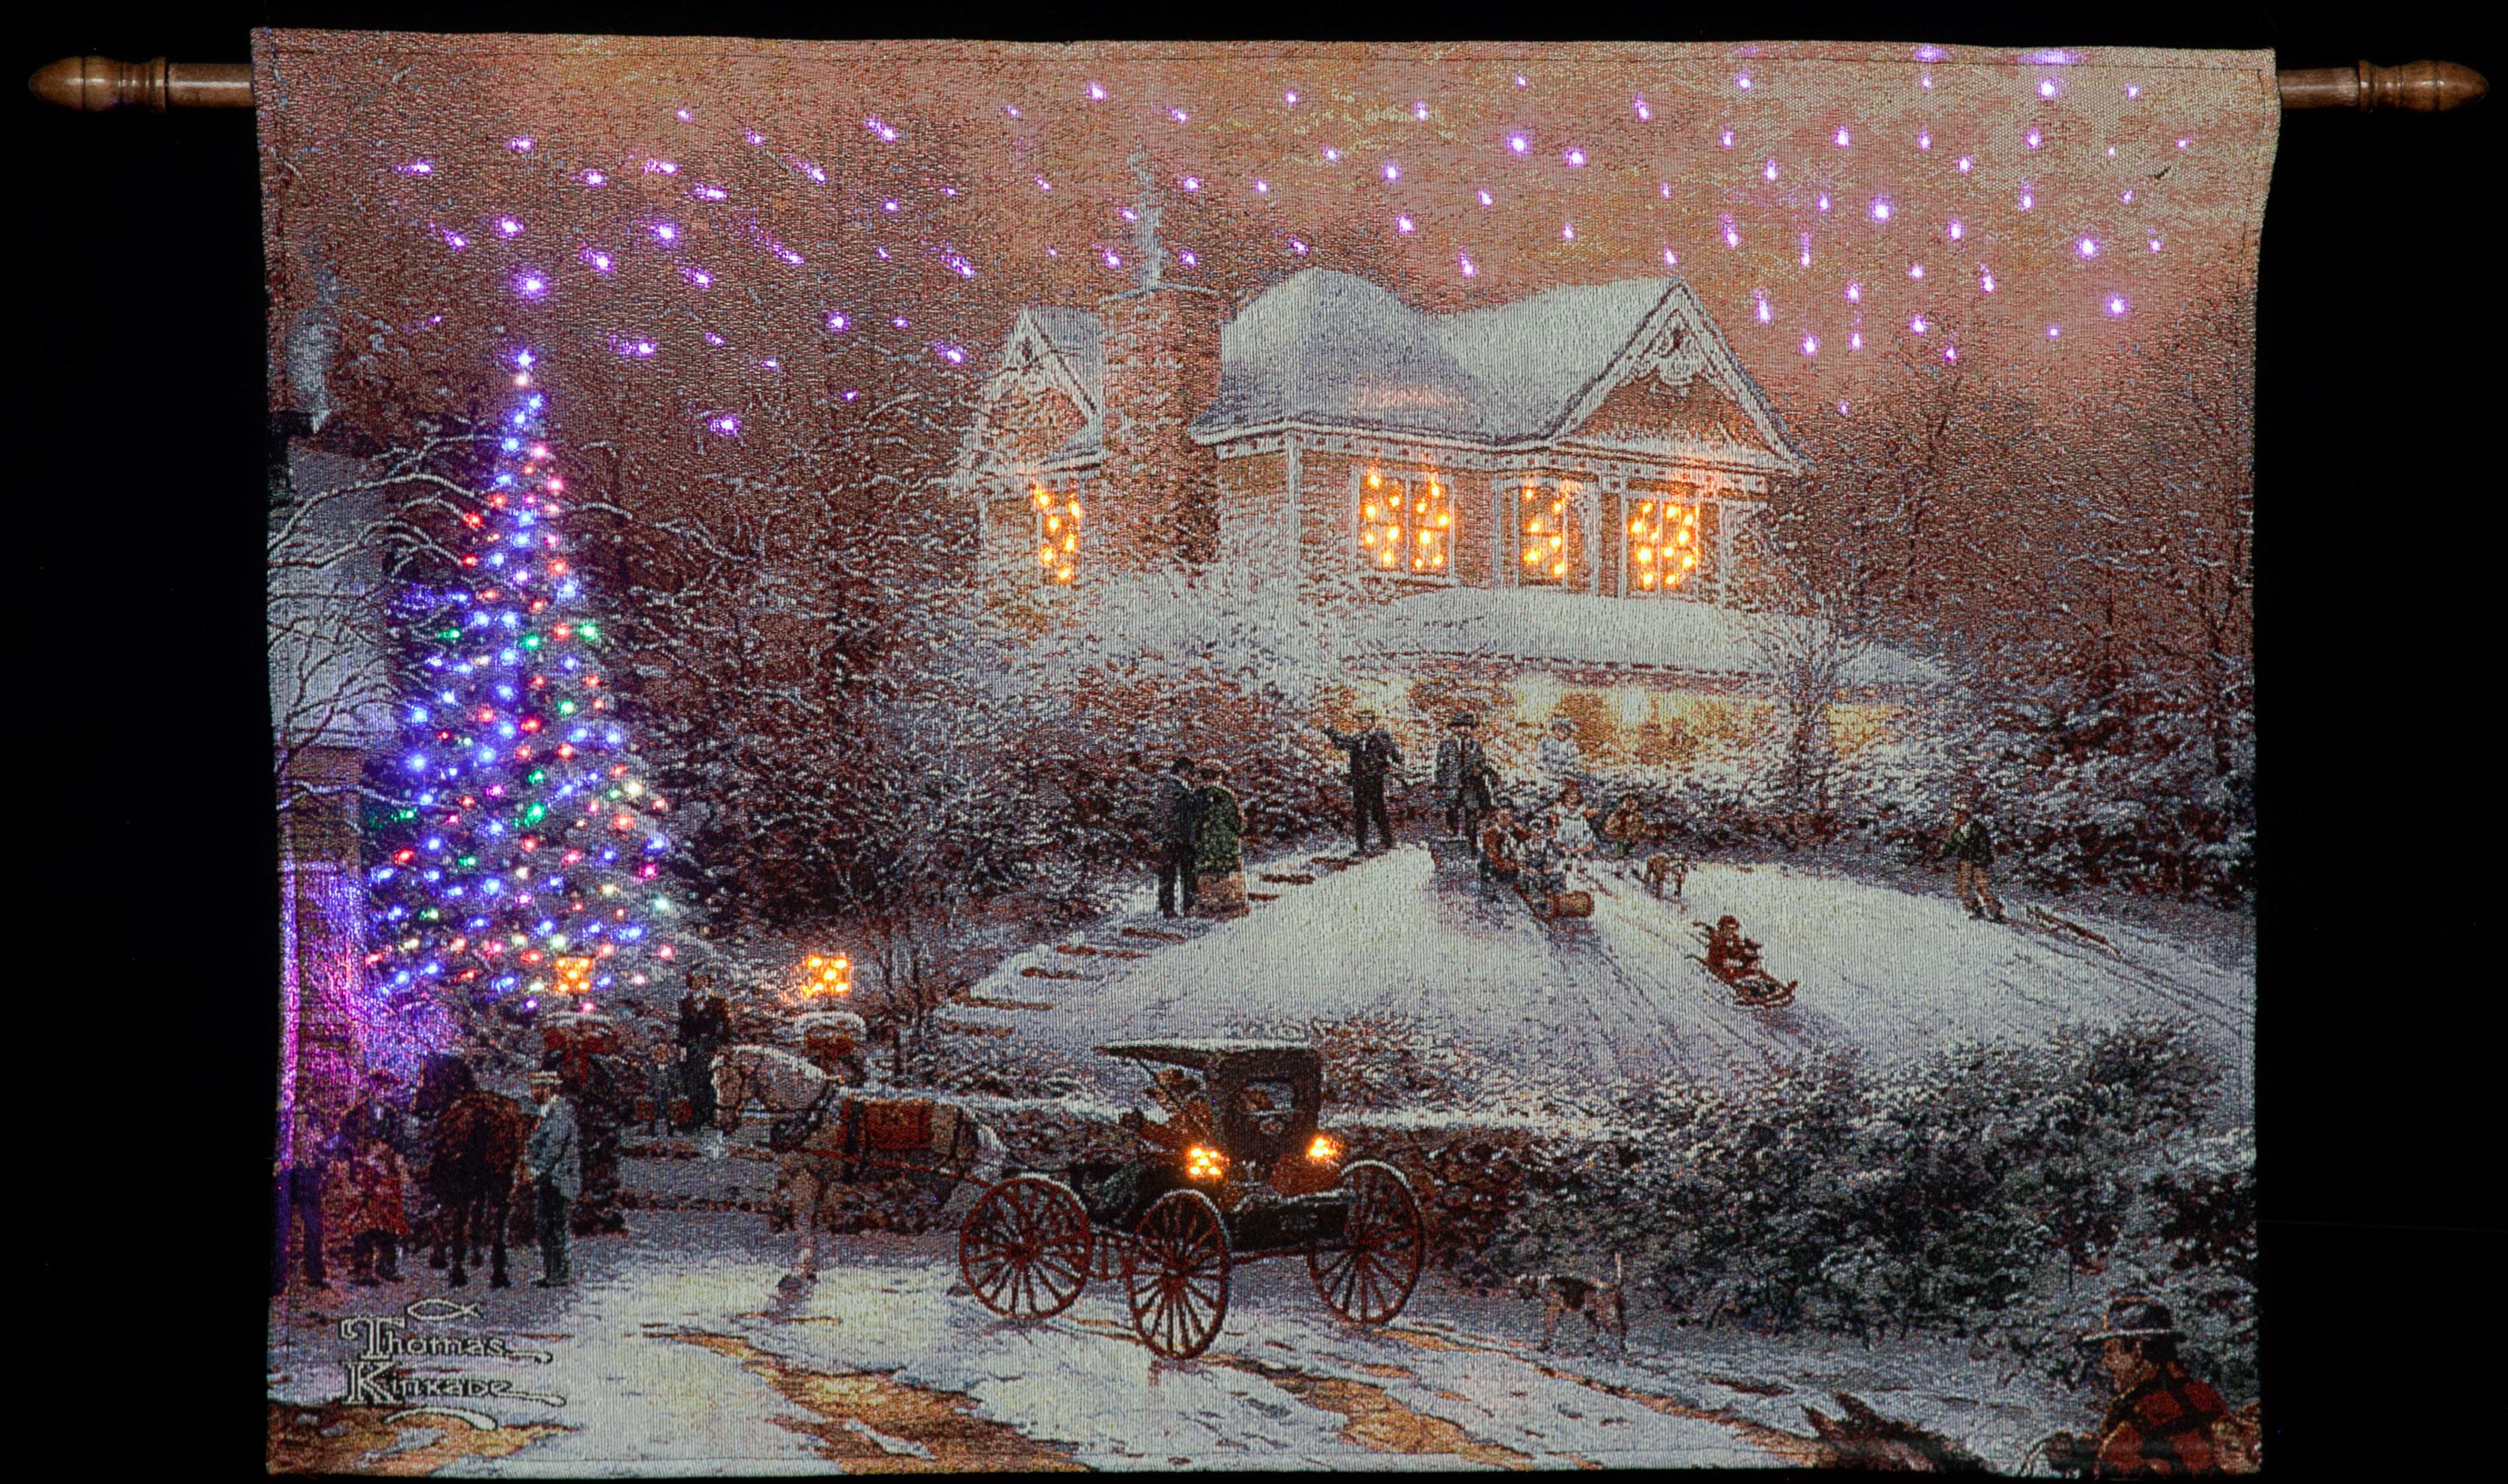 Thomas Kinkade Victorian Christmas Illuminated Hanging Tapestry